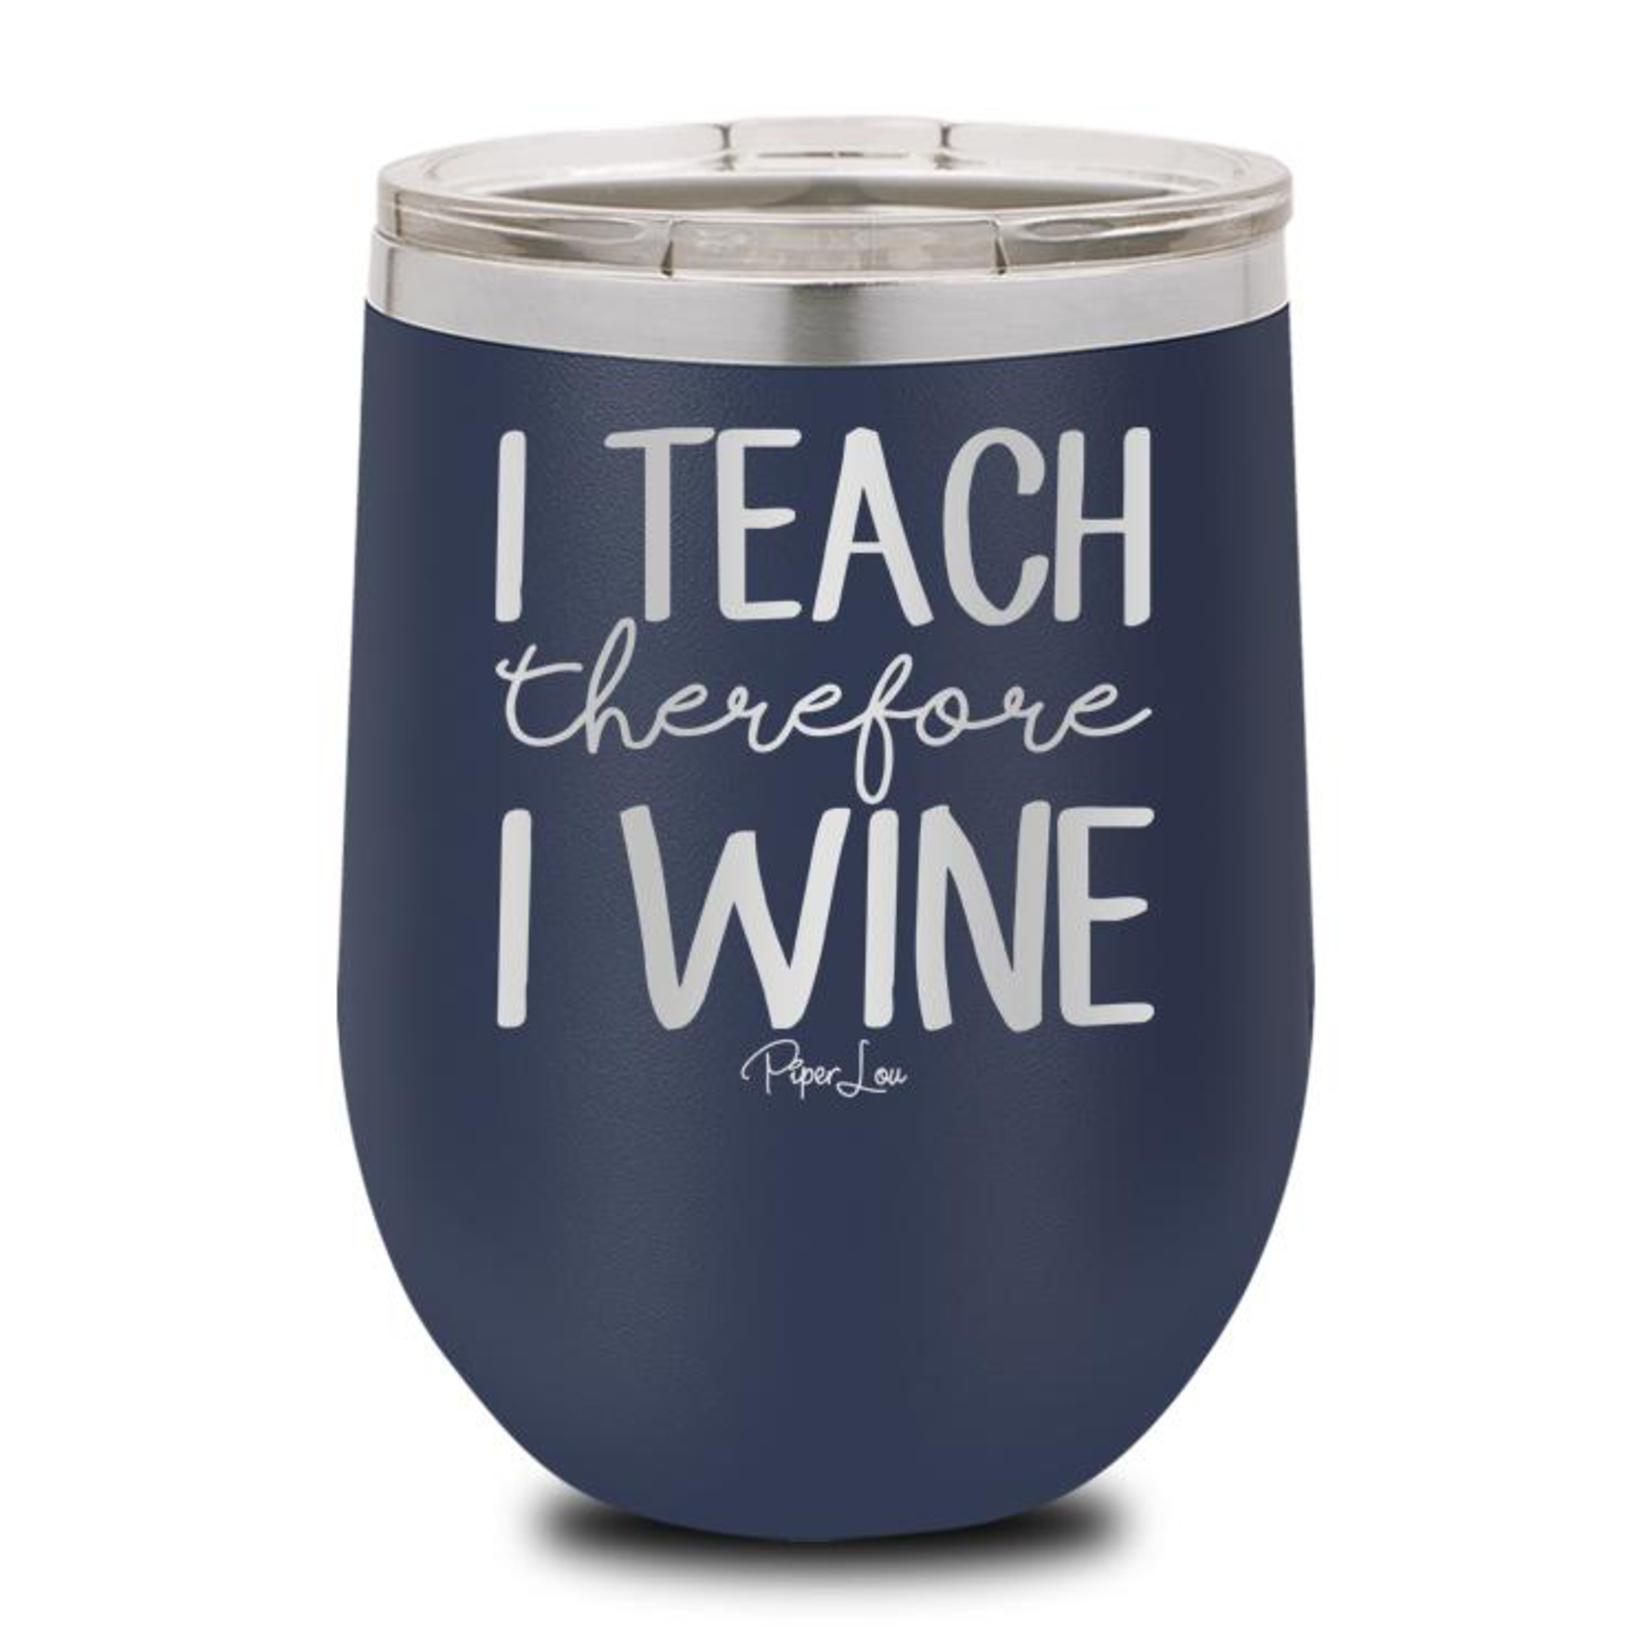 Piper Lou I Teach I Wine Cup, sale item, Was $29.99